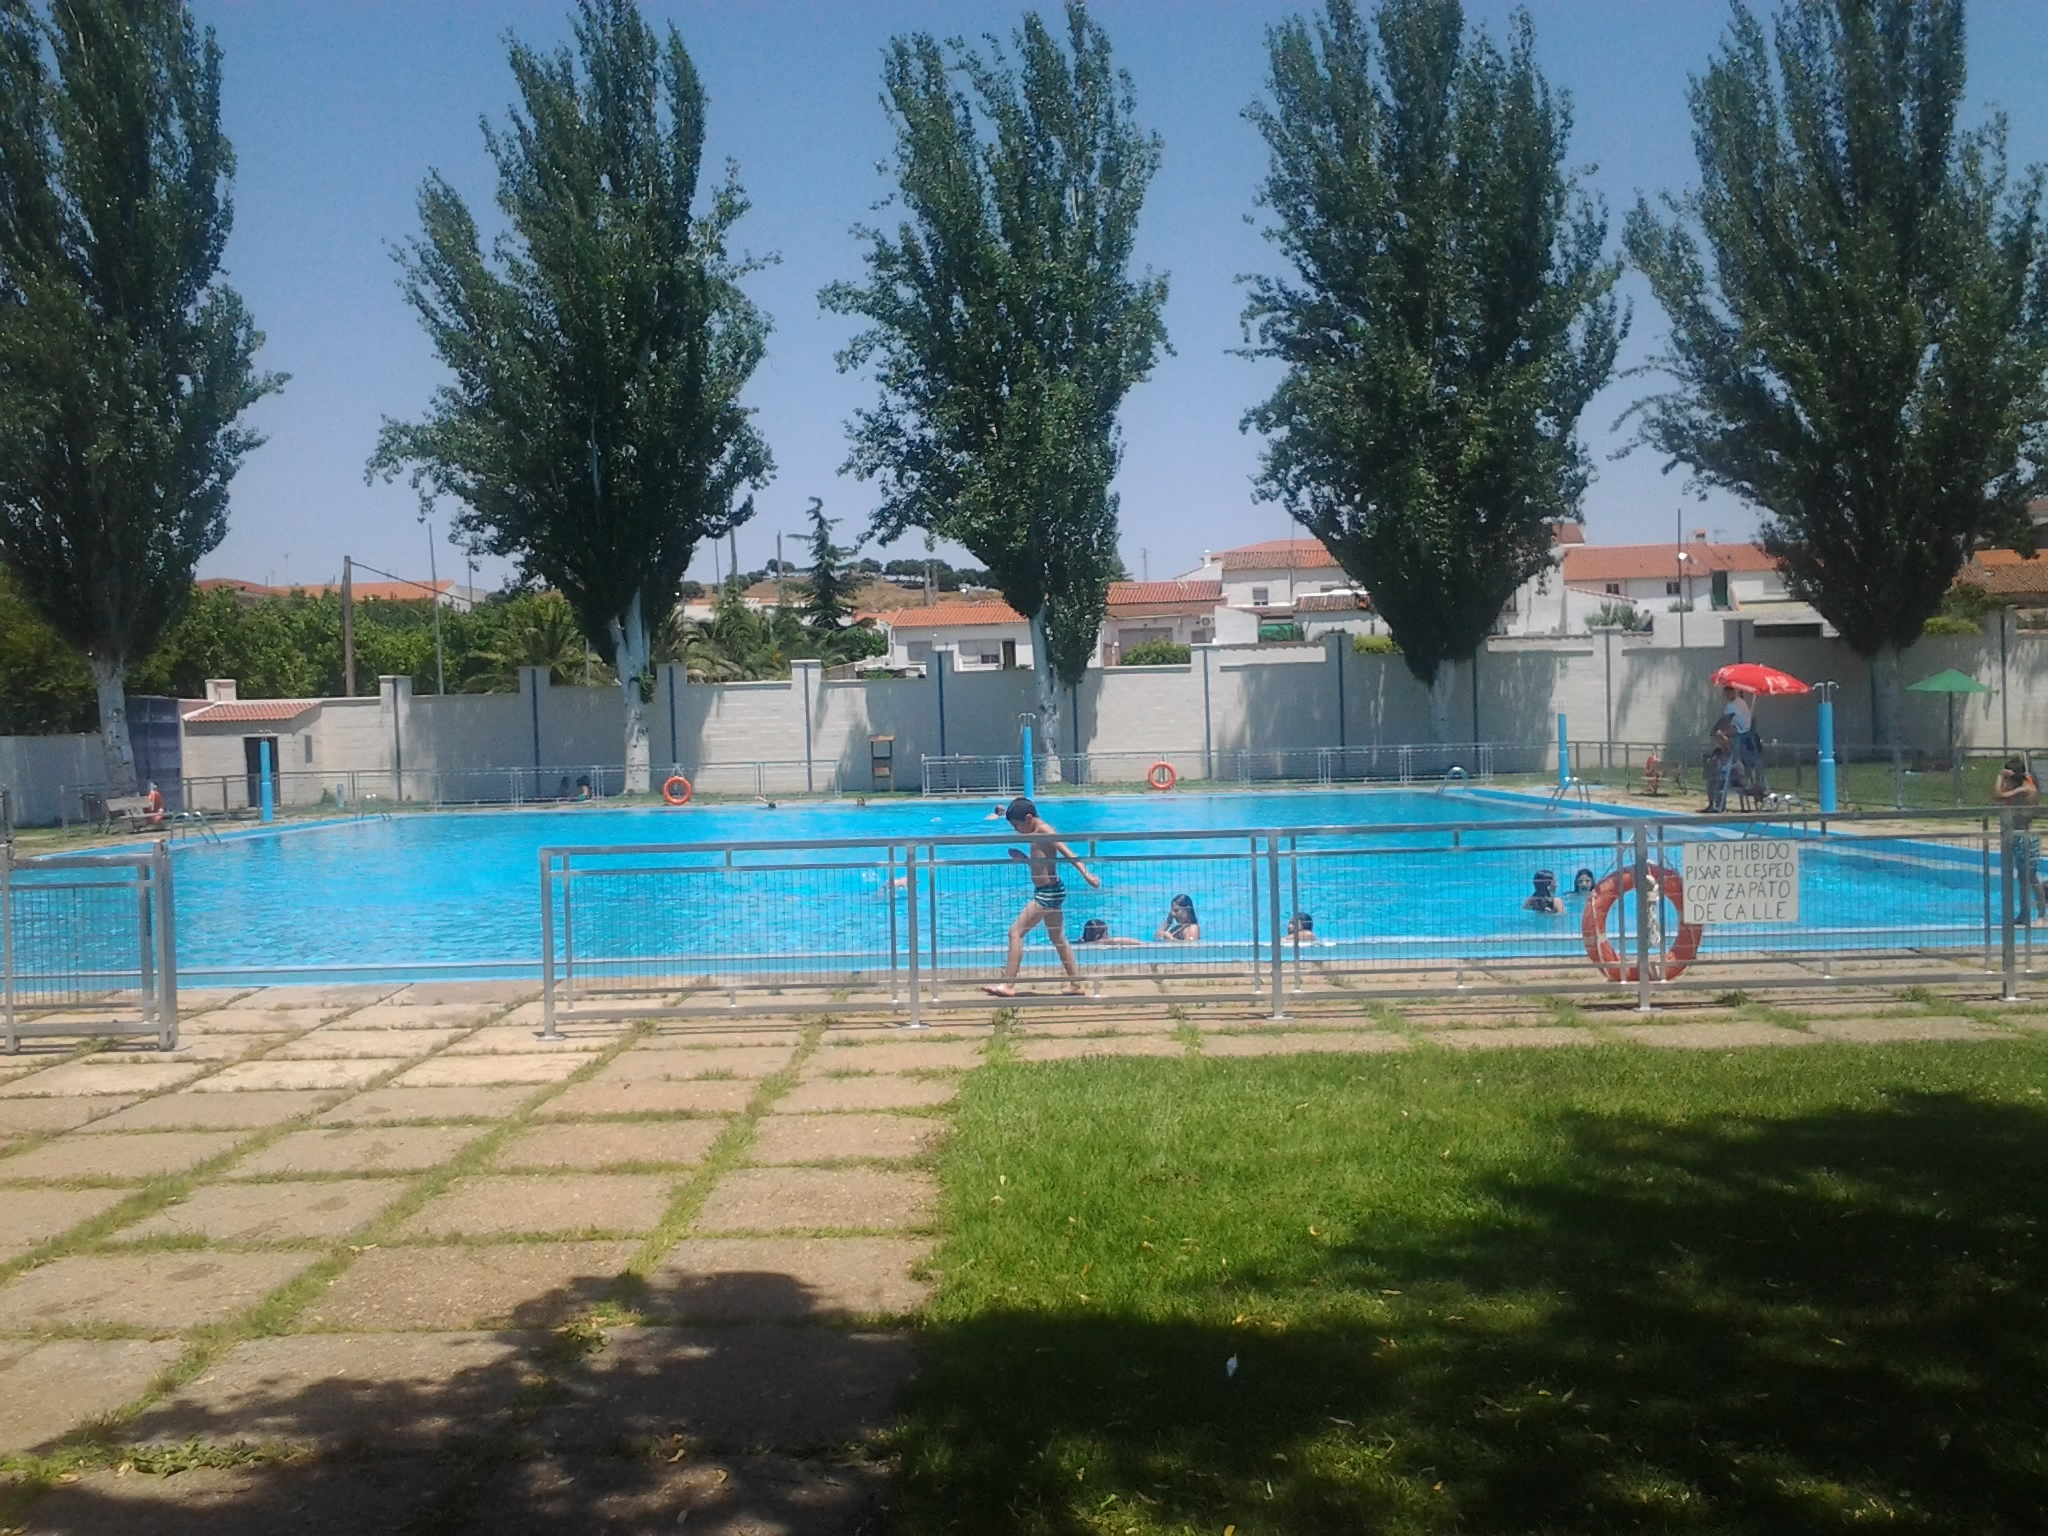 Abre sus puertas la piscina municipal for Piscina municipal de salt